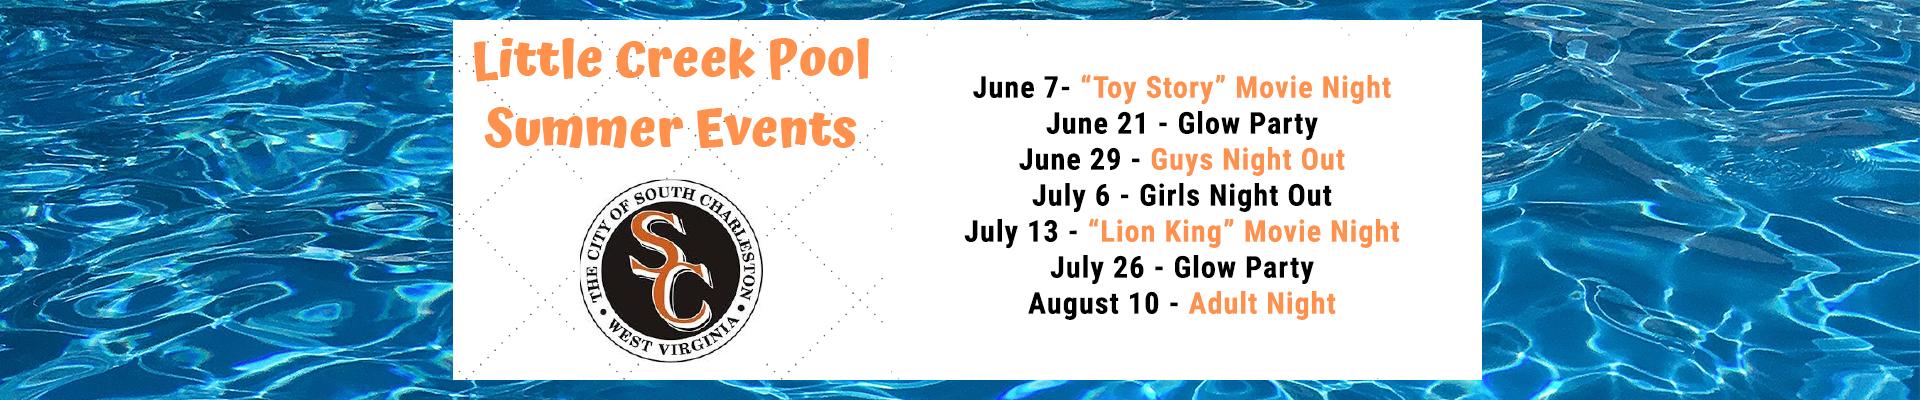 Little Creek Pool Summer Events